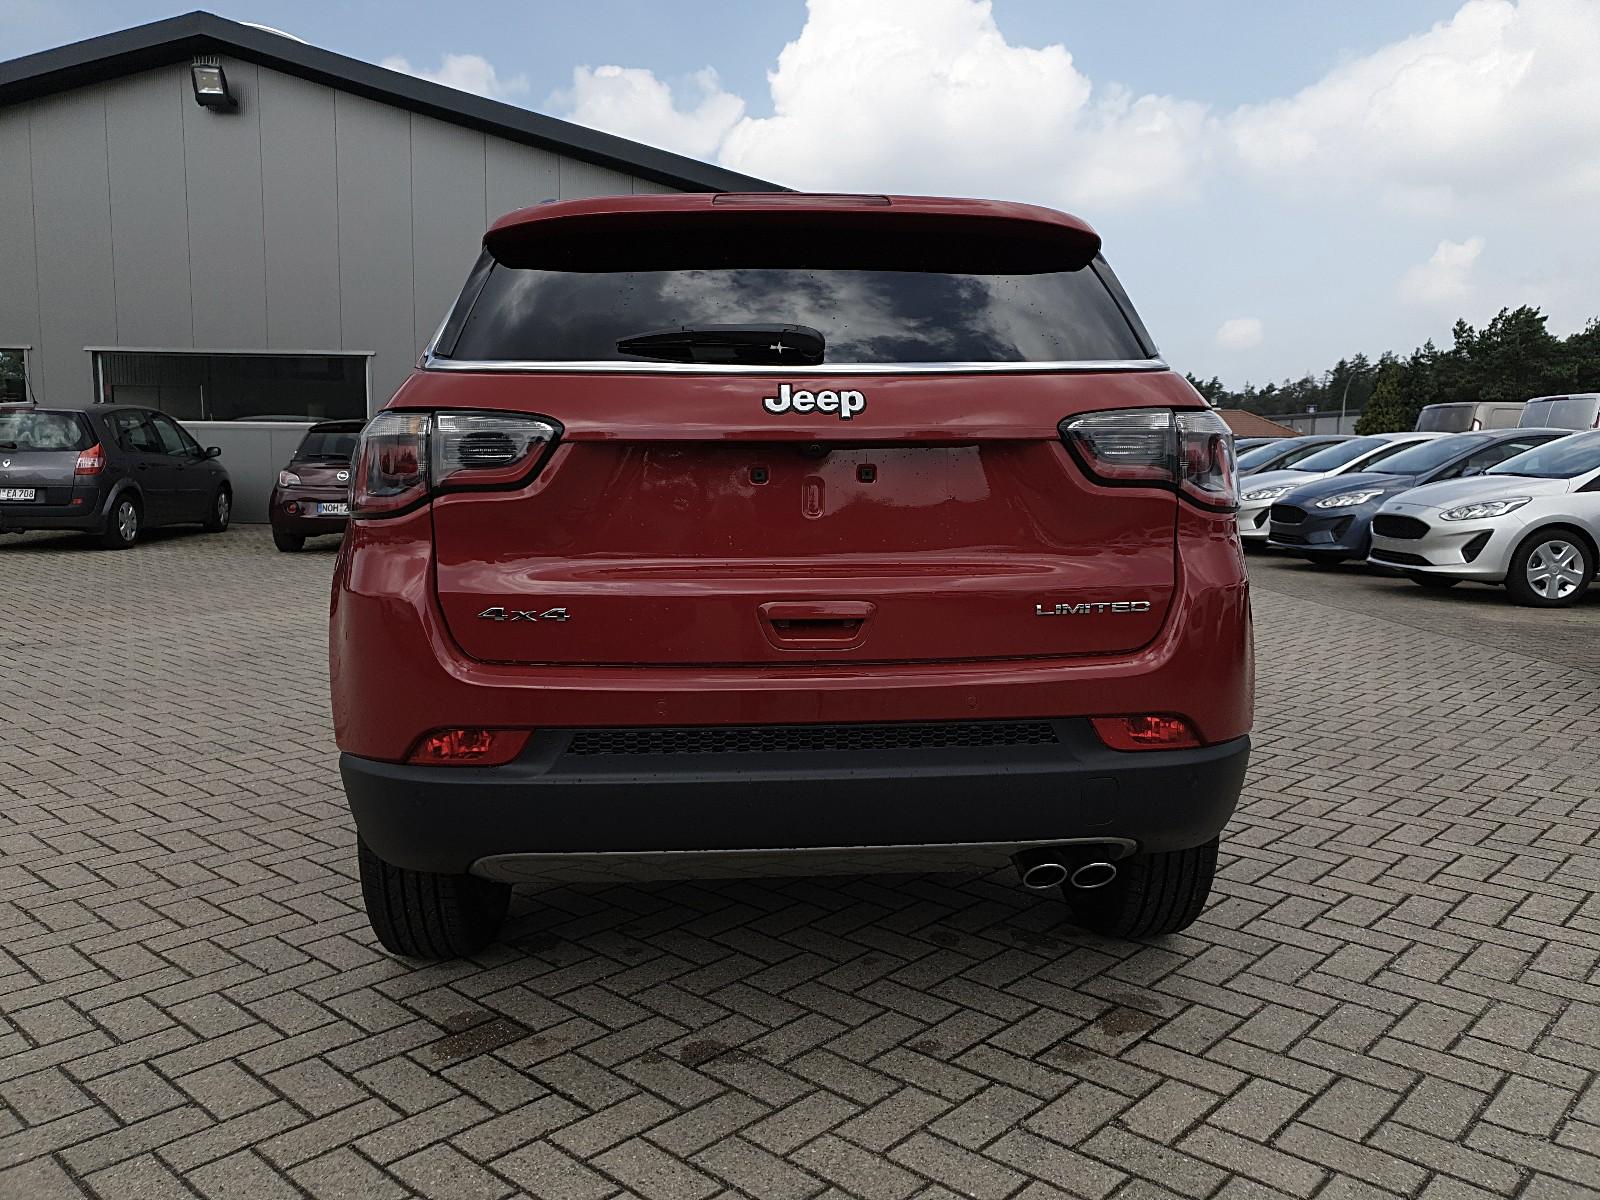 JEEP COMPASS 1.4 170PS 4x4 Automatik Limited Voll-Leder Sitzheizung Lenkradhe Viscaal Fahrzeuggrosshandel GmbH, D-49847 Itterbeck